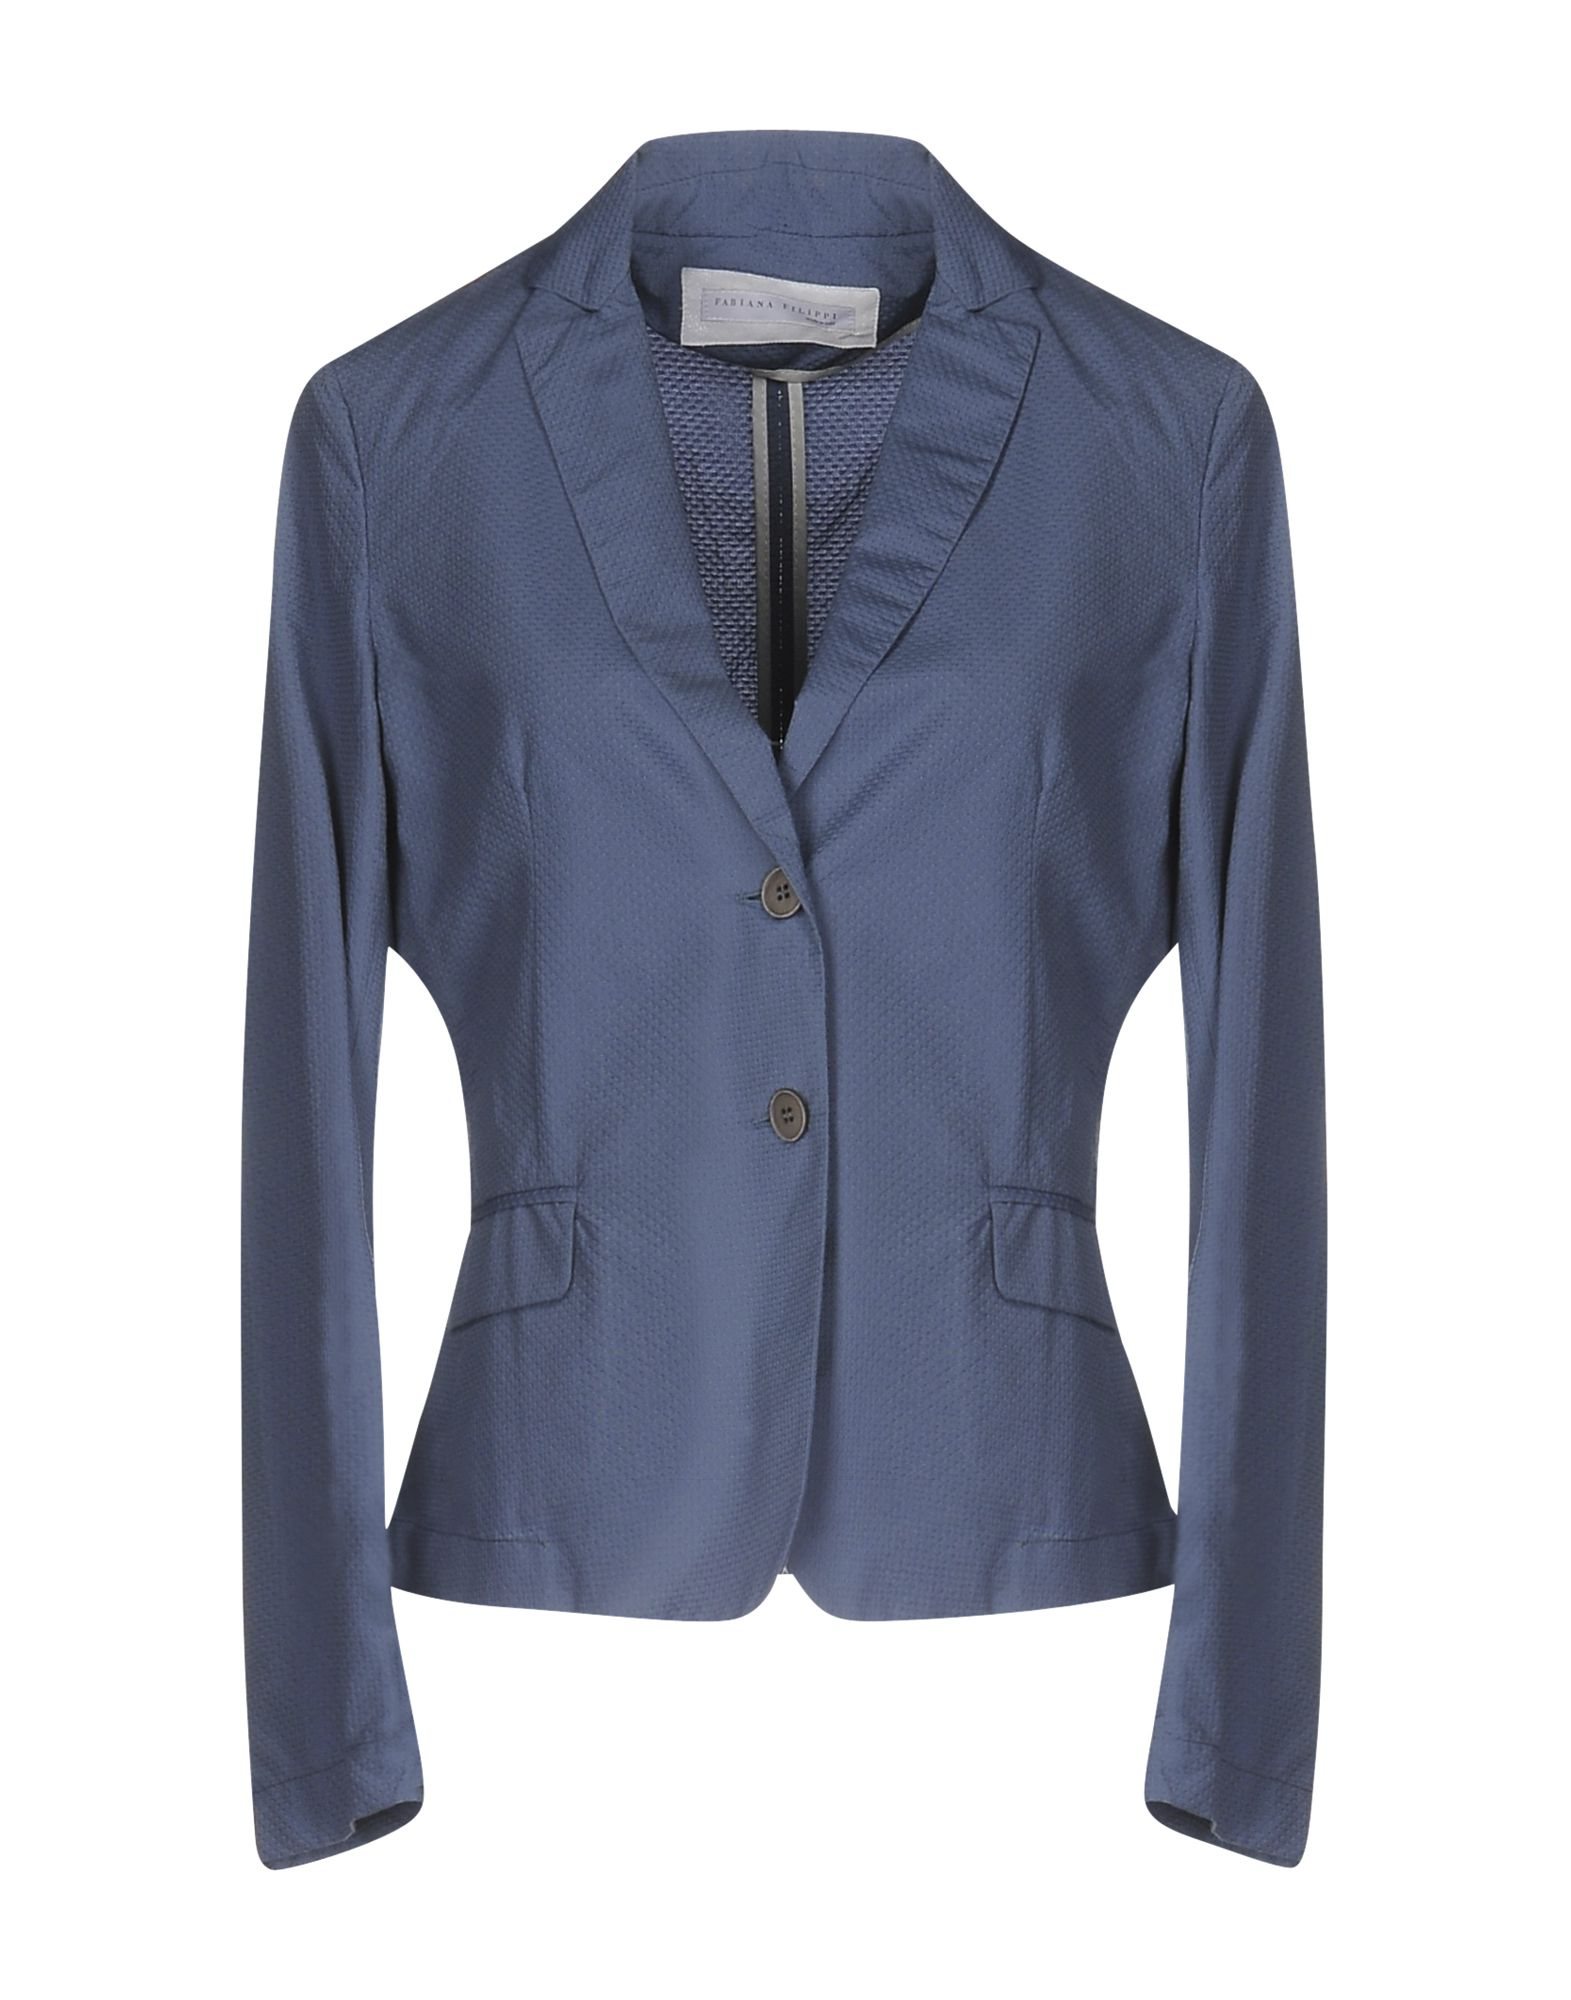 FABIANA FILIPPI Damen Jackett Farbe Blaugrau Größe 7 jetztbilligerkaufen